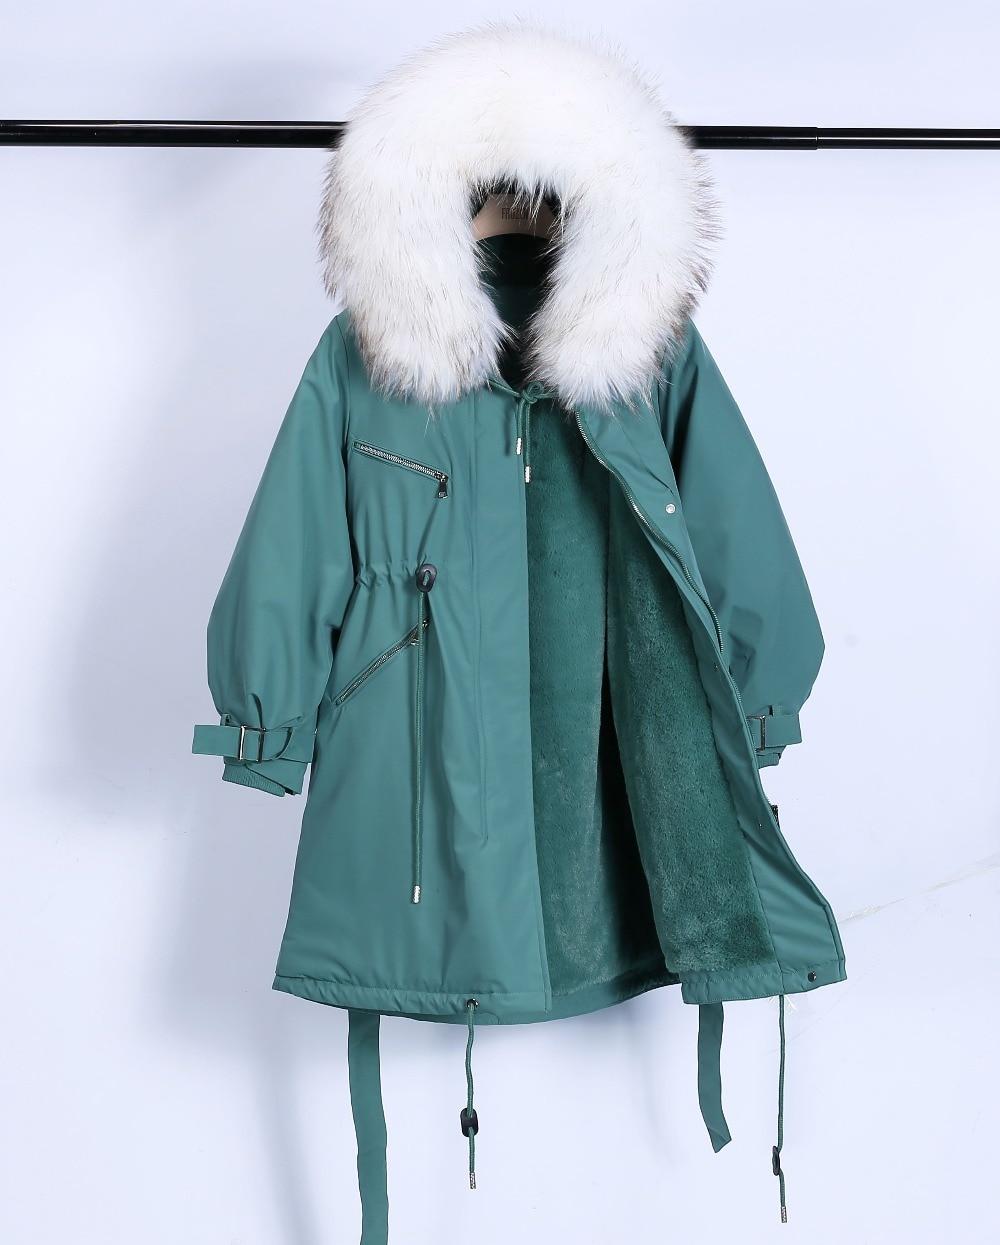 Large Natural Raccoon Fur Winter Jacket Women Hooded 19 Long Parkas For Female Thick Slim Down Winter Coat Women Waterproof 24